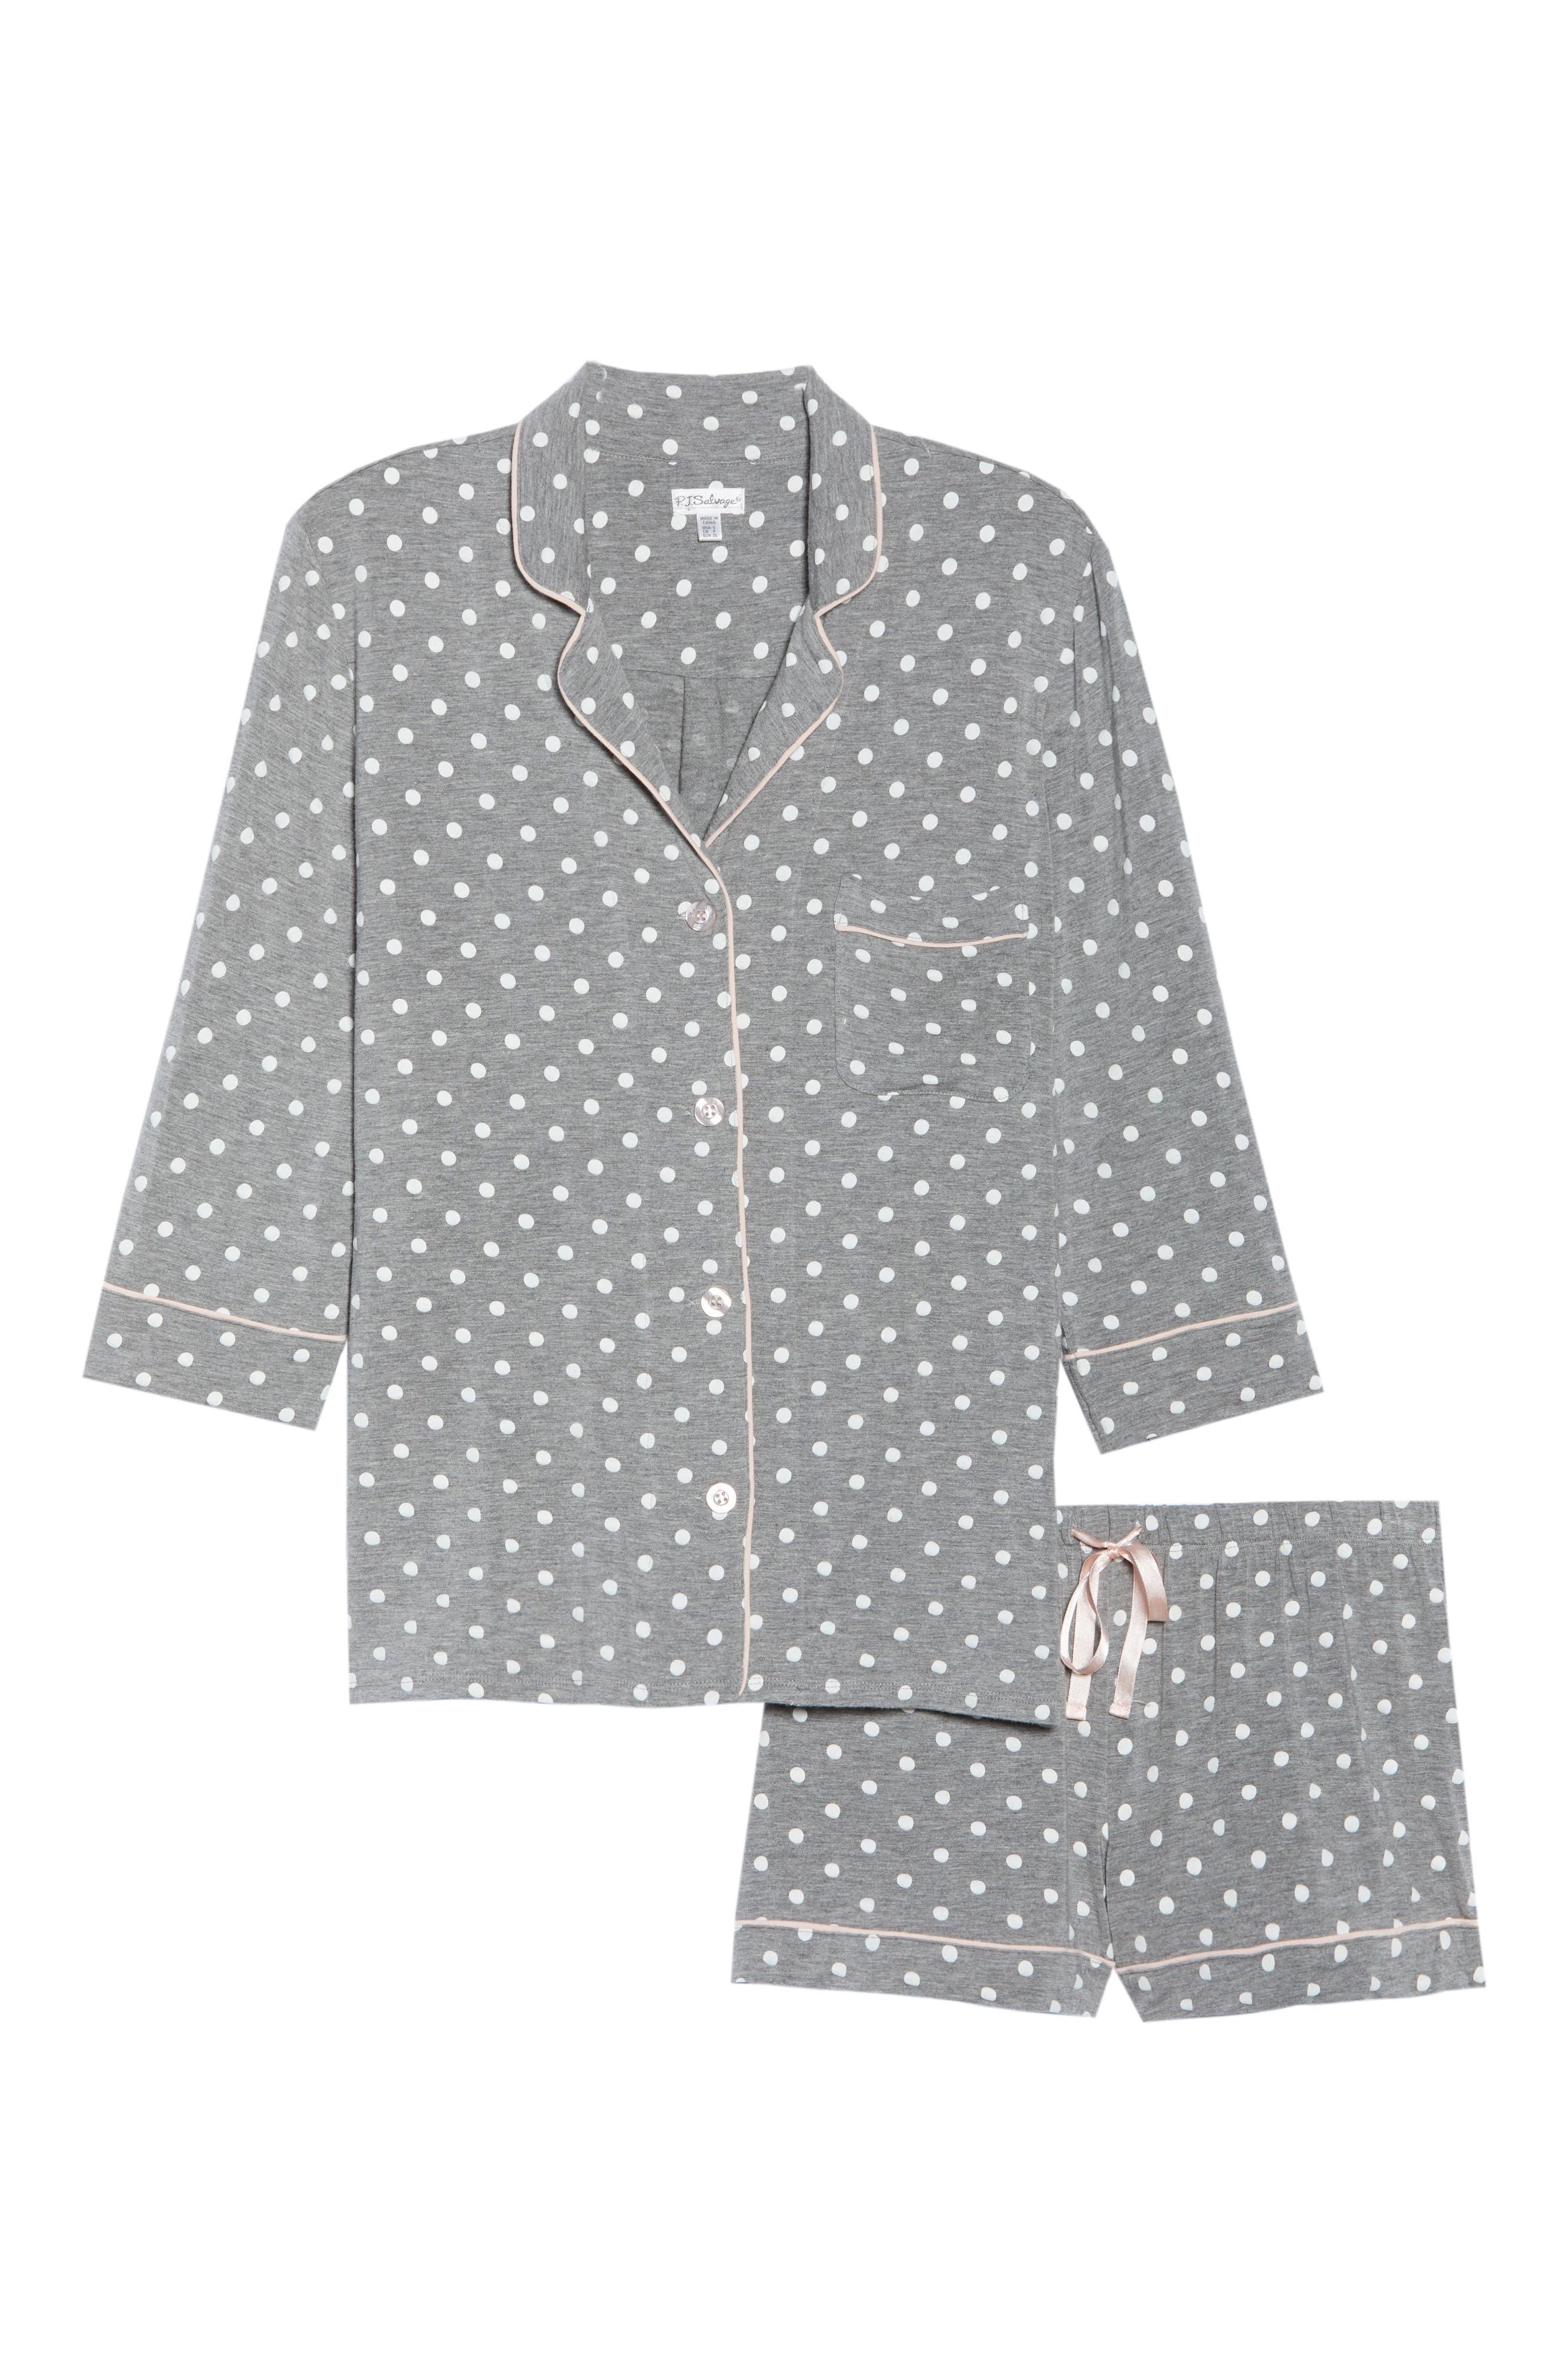 Modal Three-Quarter Sleeve Short Pajamas,                             Alternate thumbnail 6, color,                             029